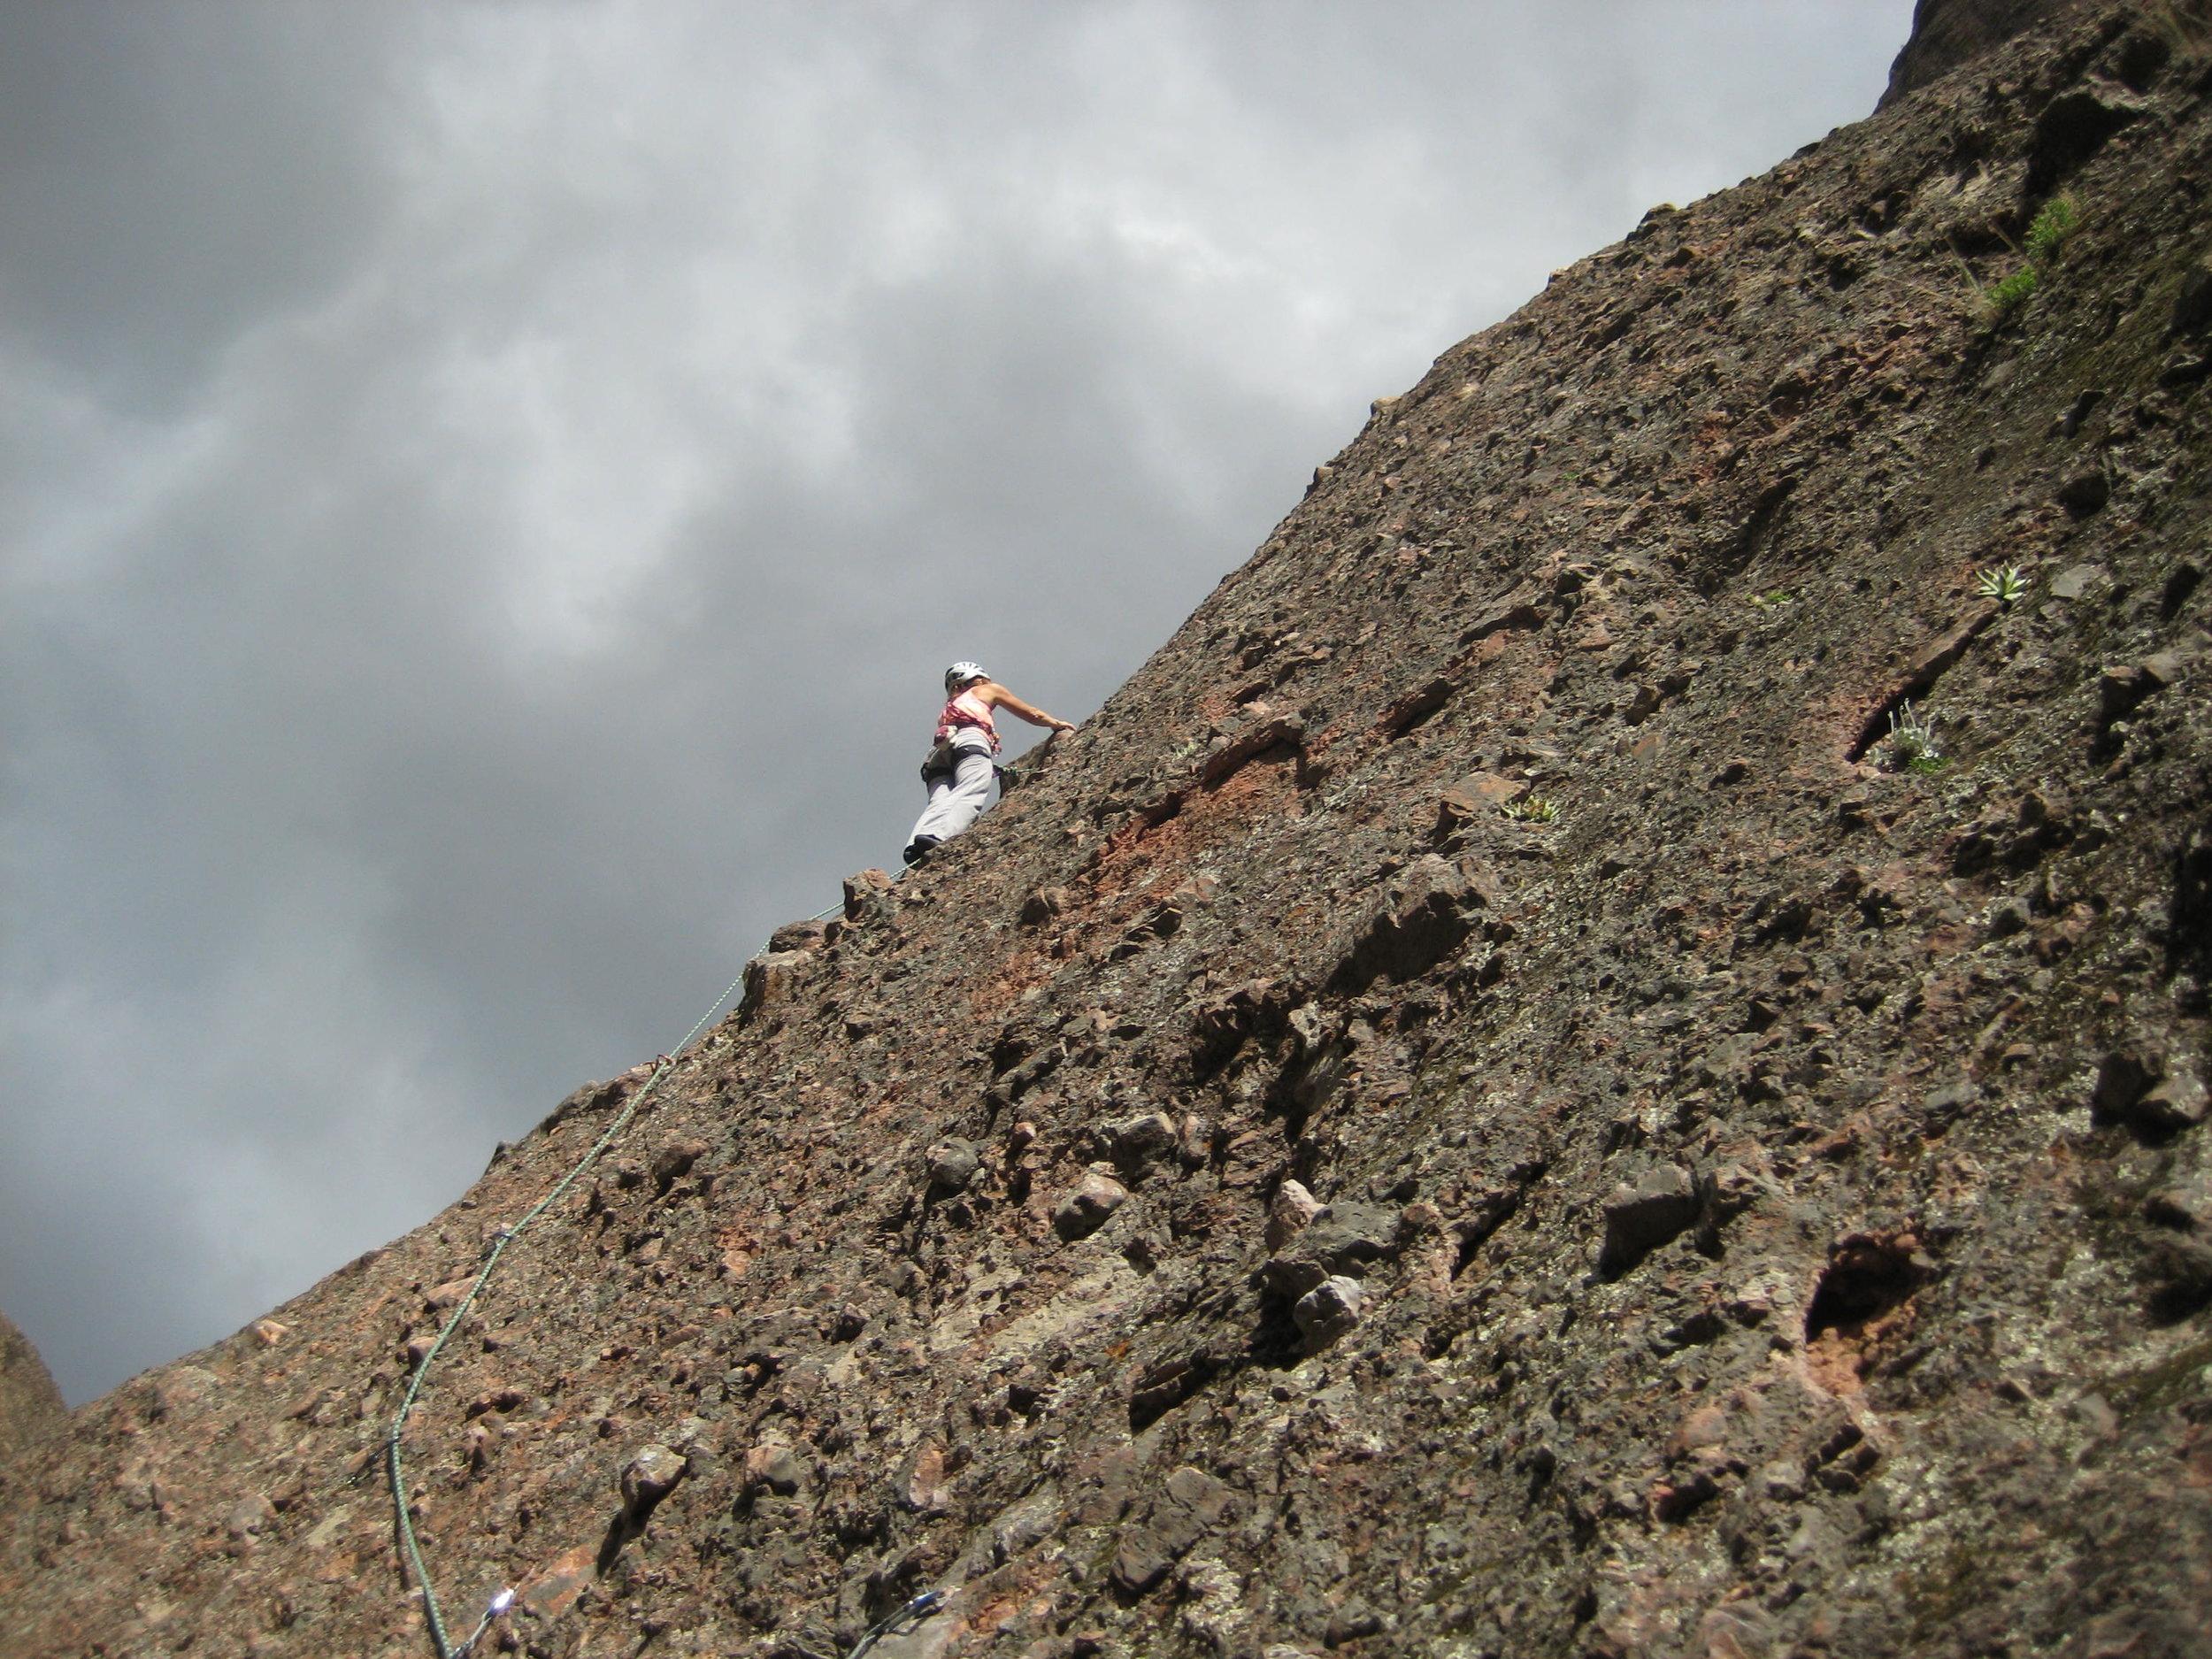 IMG_8823 Chockstone Walk the Plank.JPG